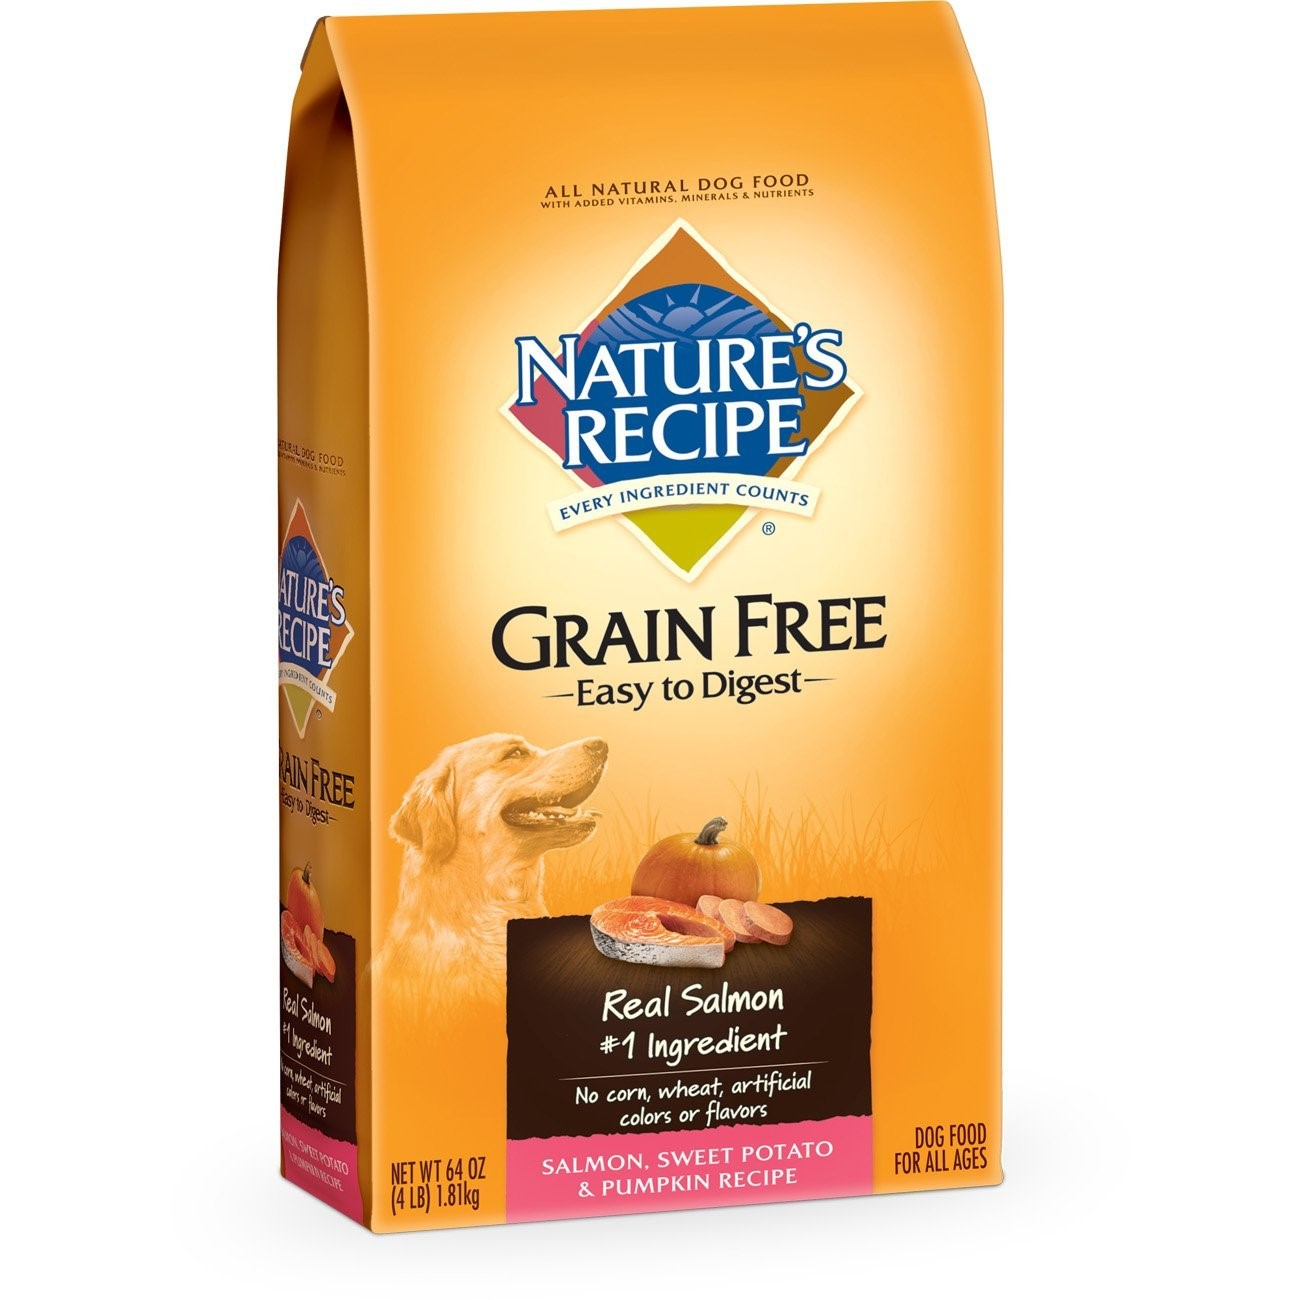 Nature's Recipe Grain Free Salmon Dry Dog Food, 4 Lb